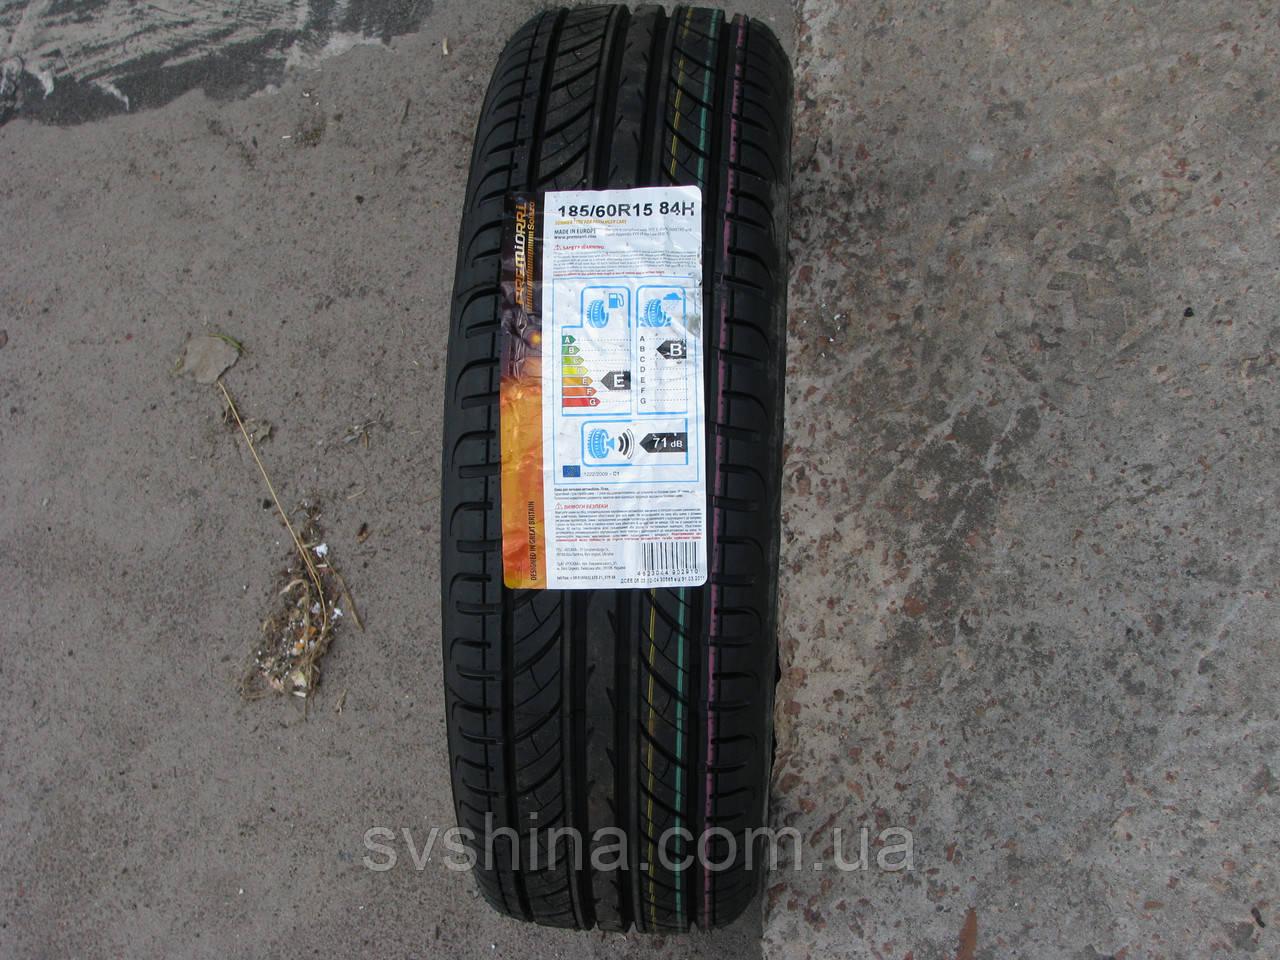 Шини 185/60R15 Premiorri Solazo, 84H